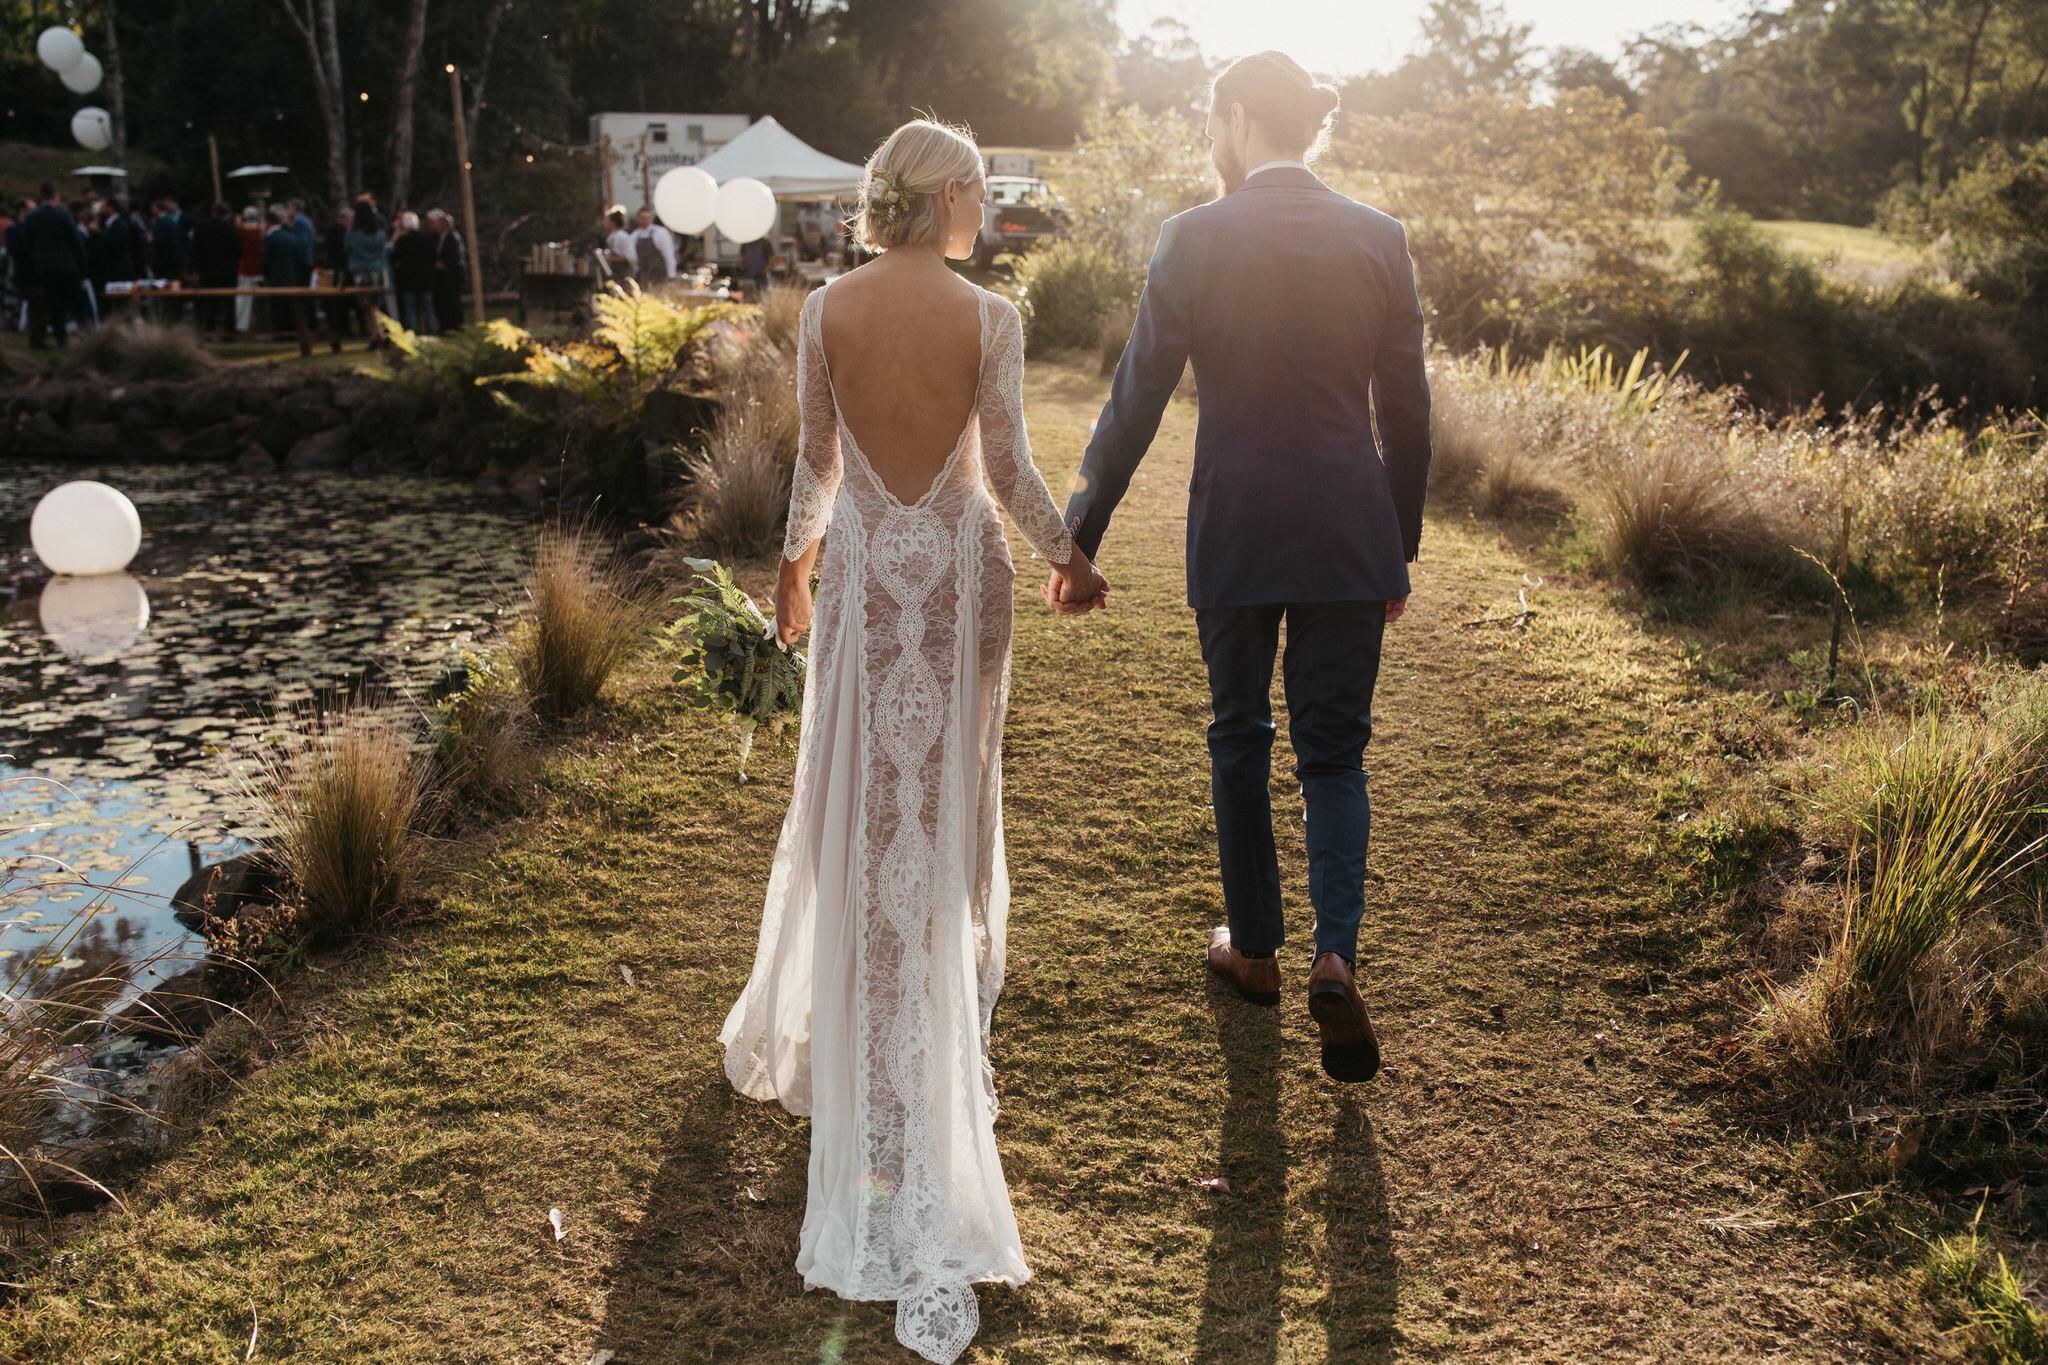 070_SBA-Jen-Tom-Wedding-262_Sunshine_Coast_wedding_photographer.jpg